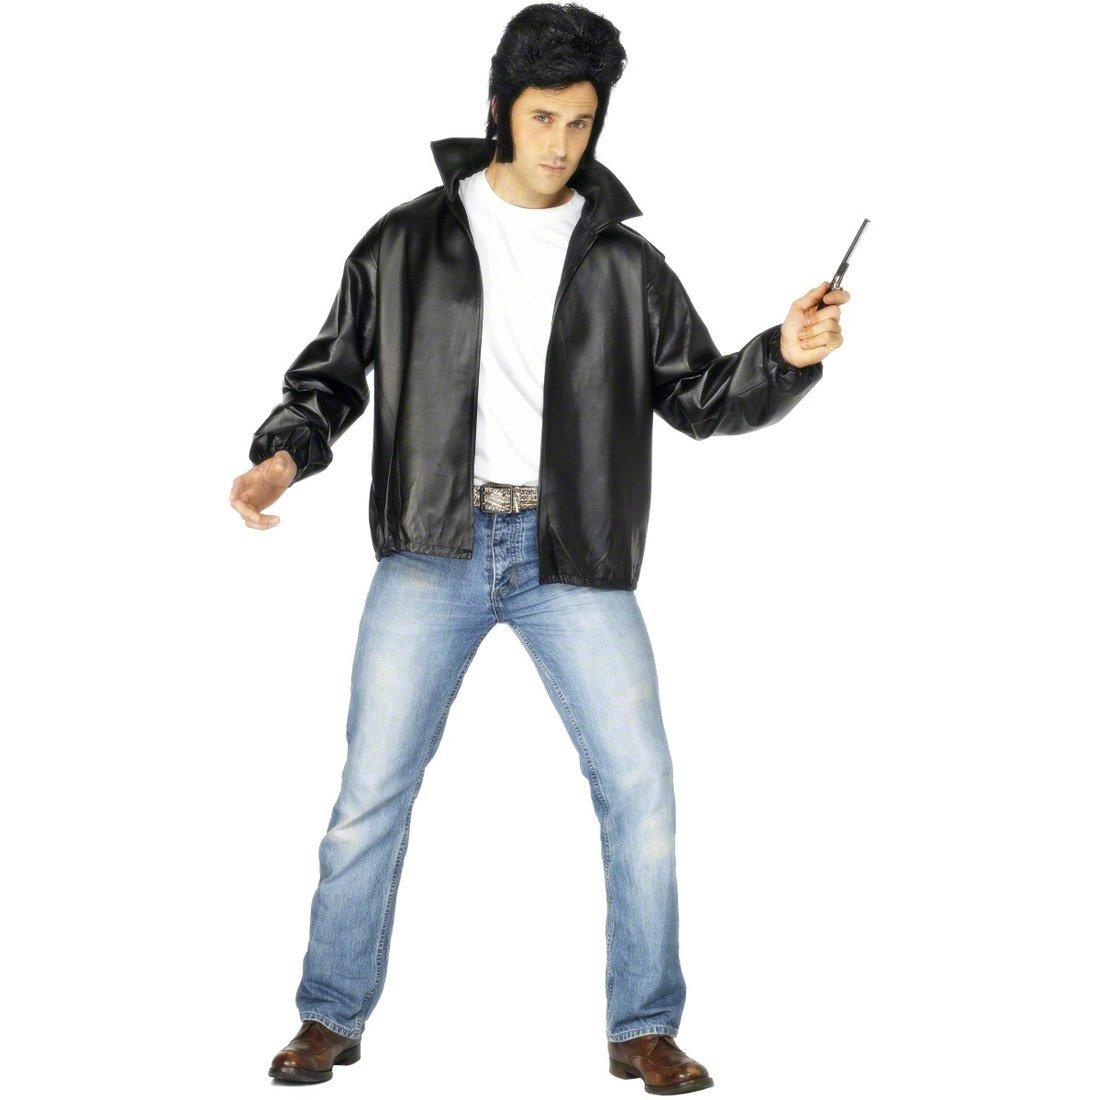 NET TOYS Giacca Grease anni 60 similpelle nera logo T-Birds rock star  rocker biker costume - XL 60 62  Amazon.it  Giochi e giocattoli 3be4cbeeae08